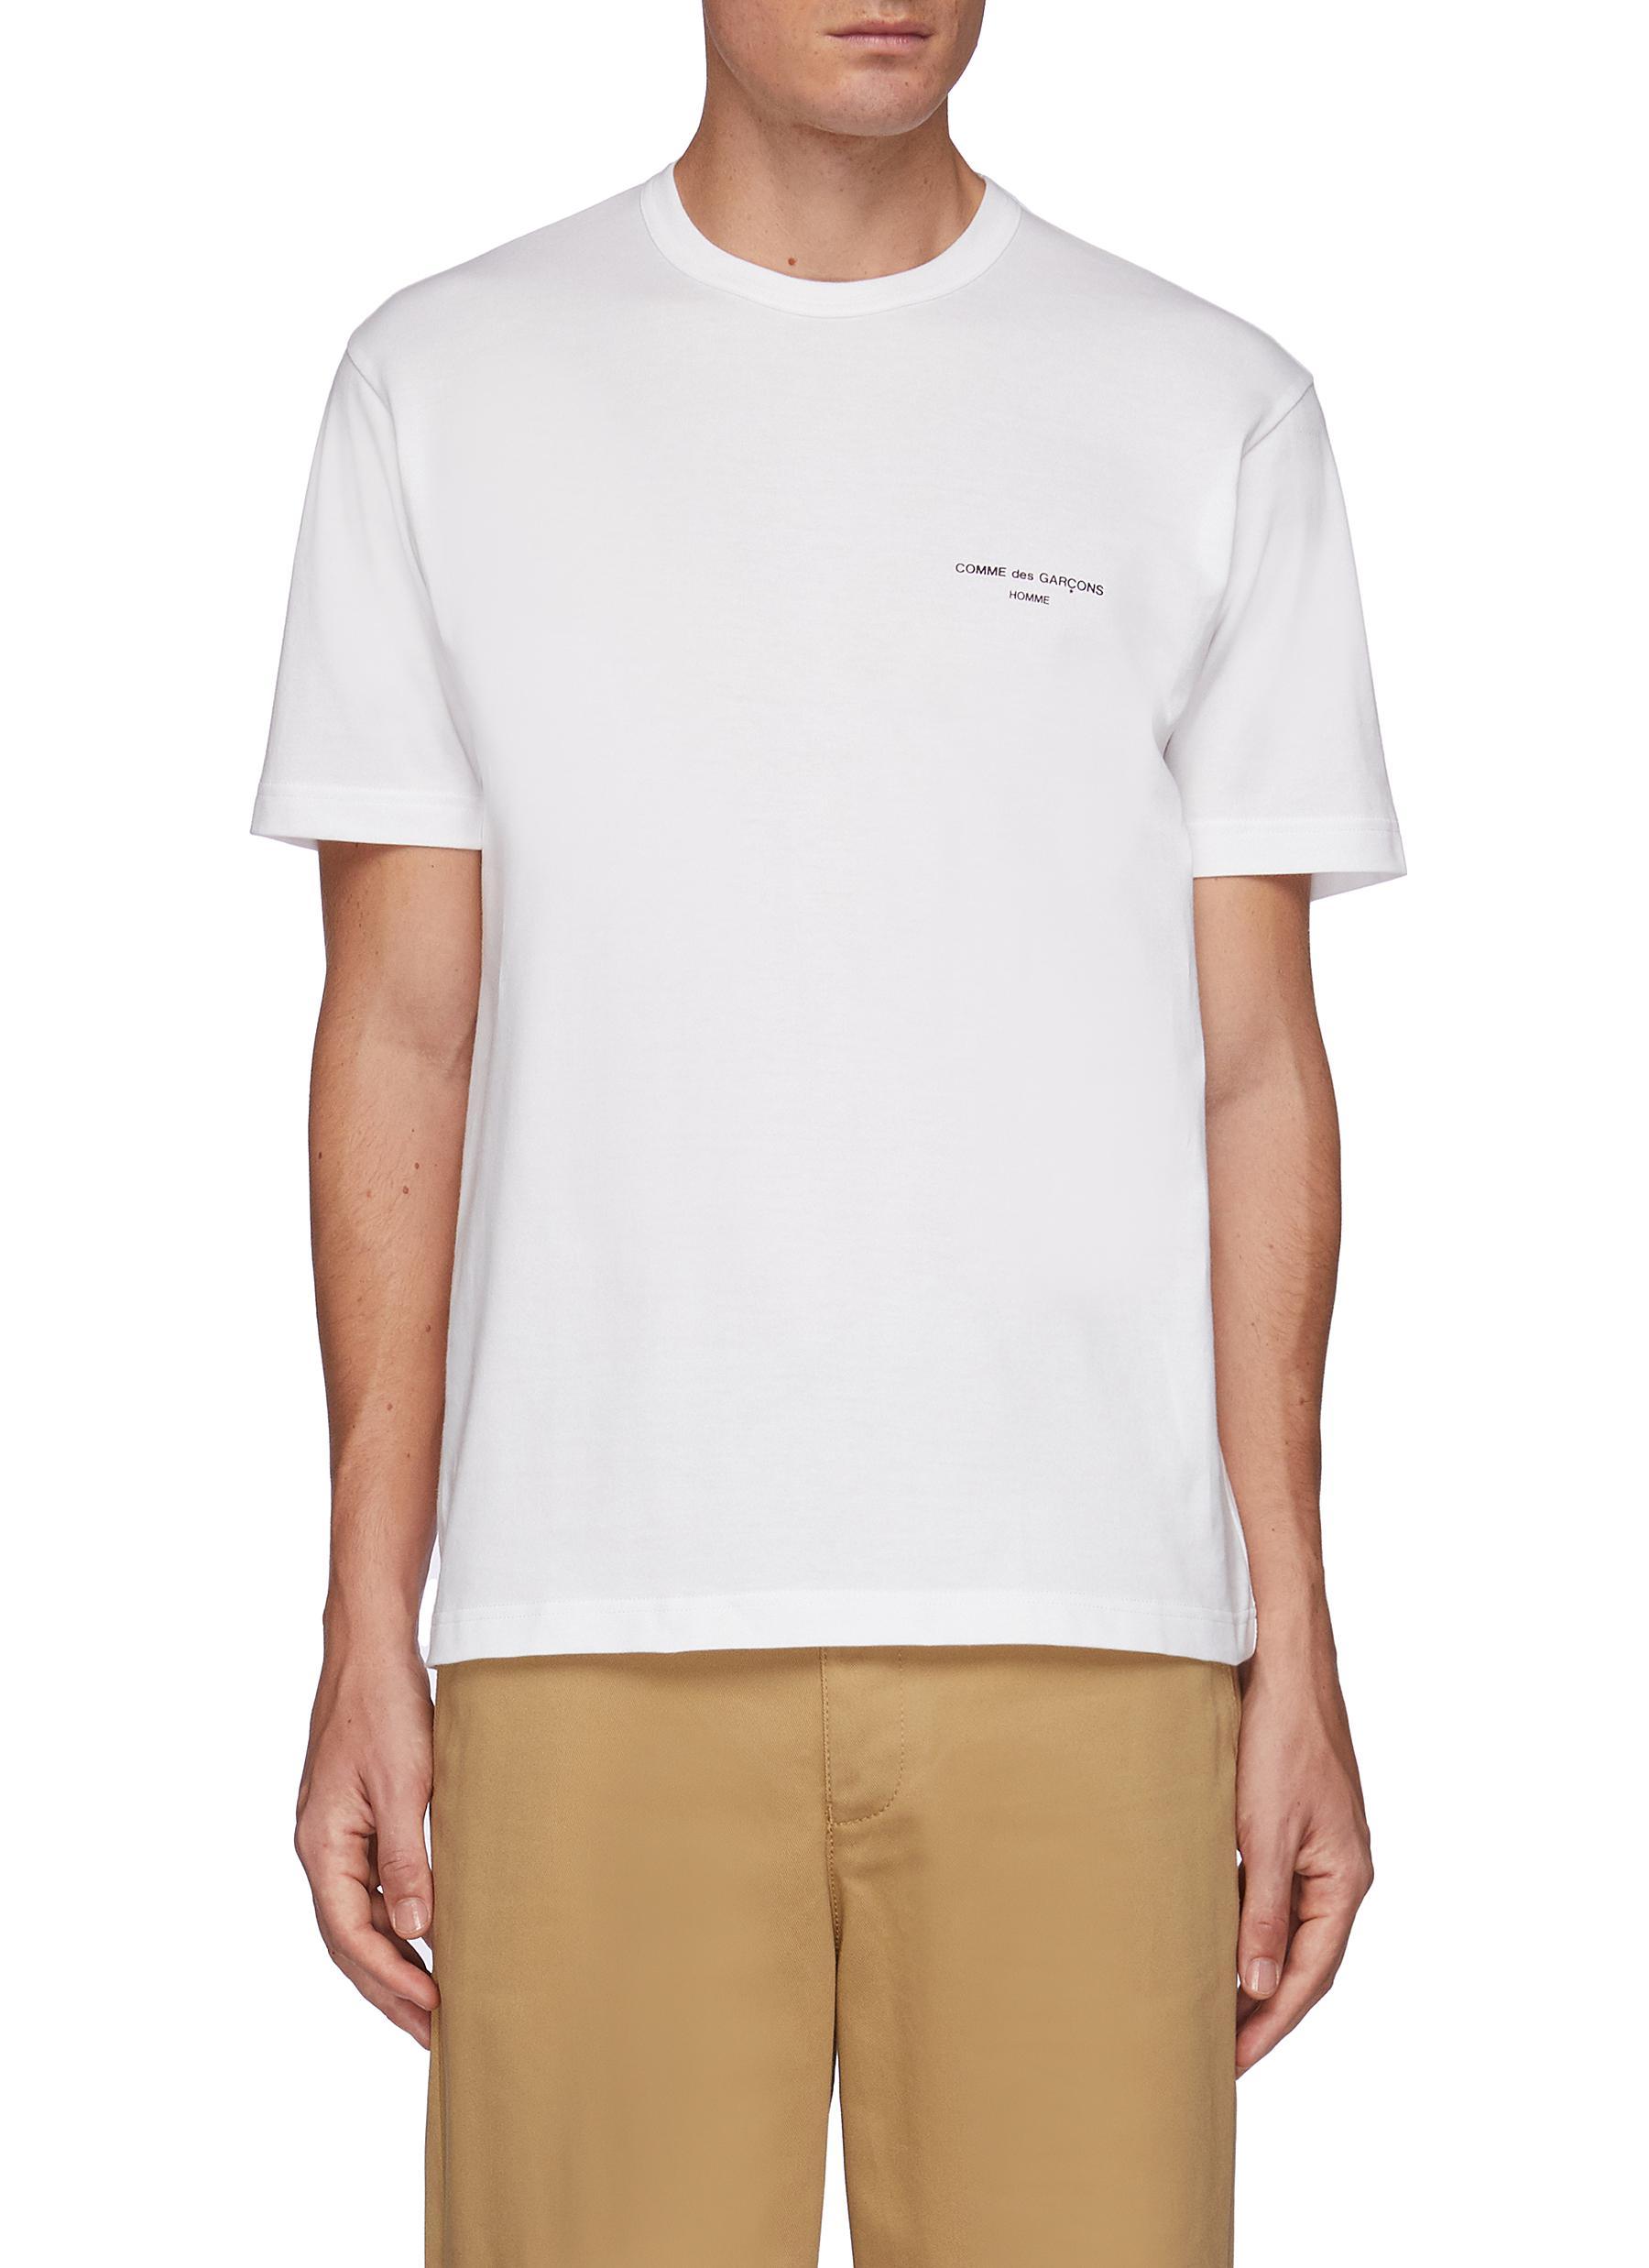 Branding Appliqued Short Sleeved Crewneck Cotton T-Shirt